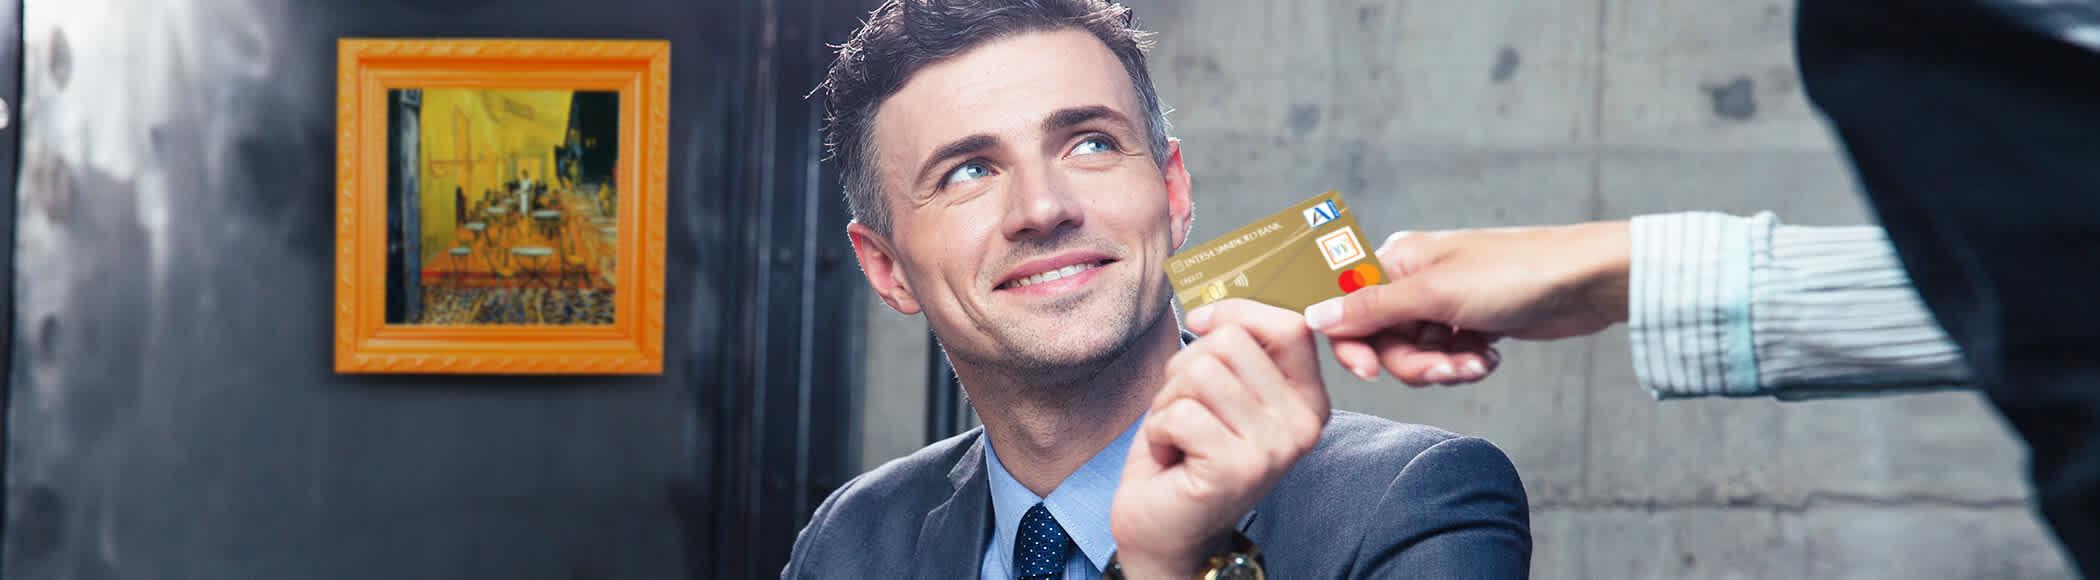 gold card Mastercard